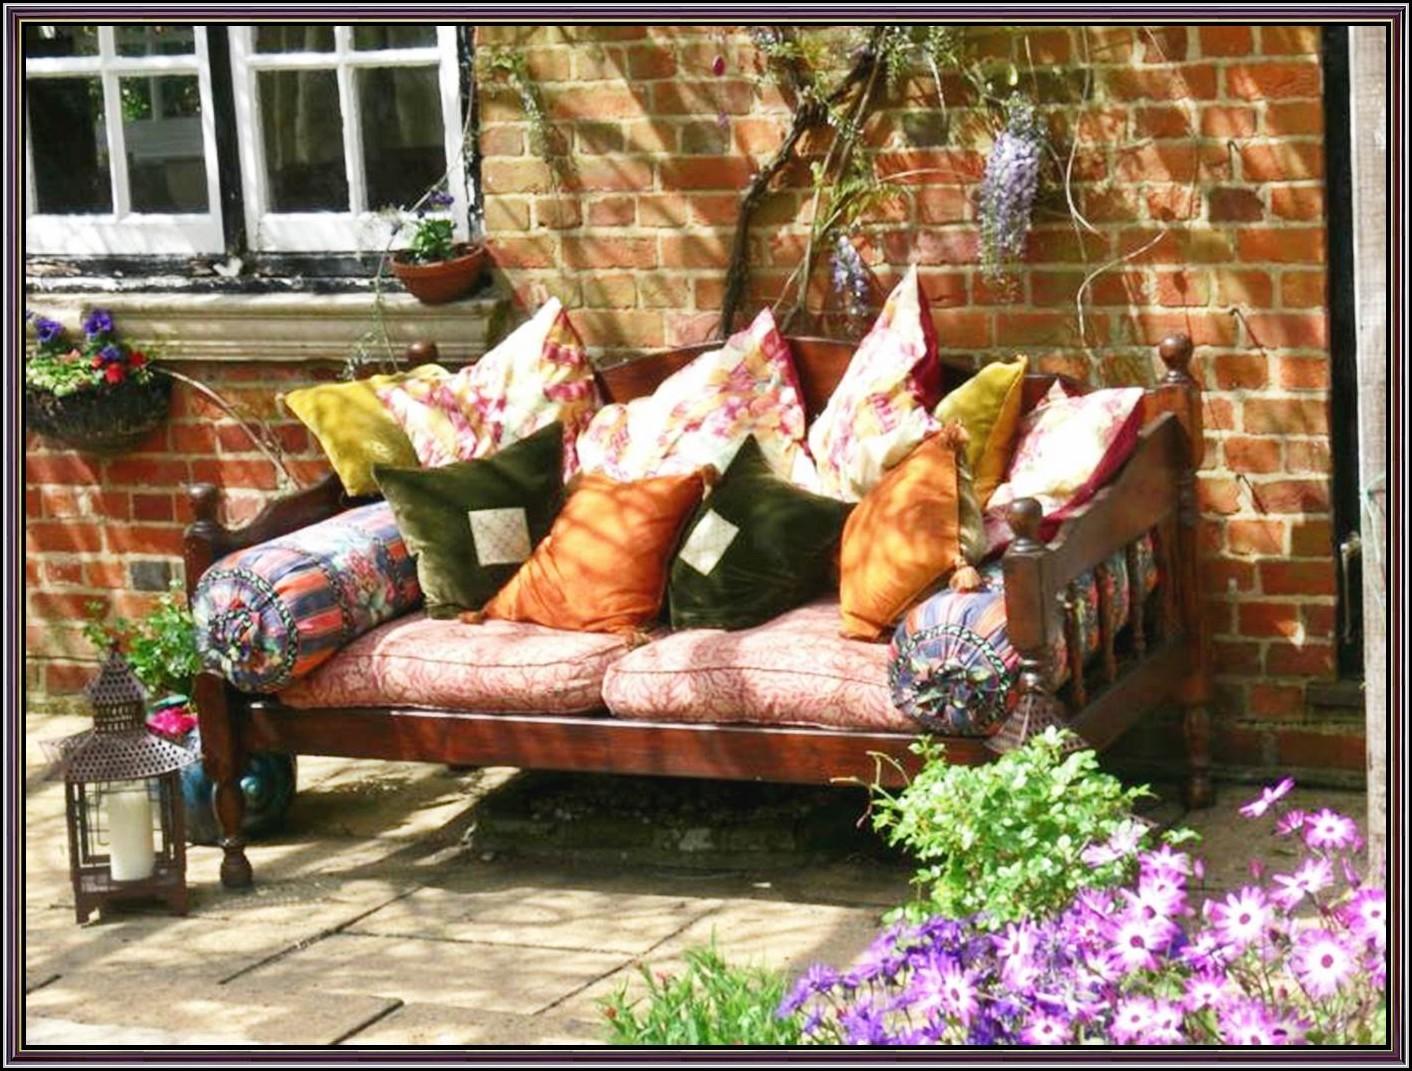 bett als sofa gestalten betten house und dekor galerie qa1v3pgrbx. Black Bedroom Furniture Sets. Home Design Ideas